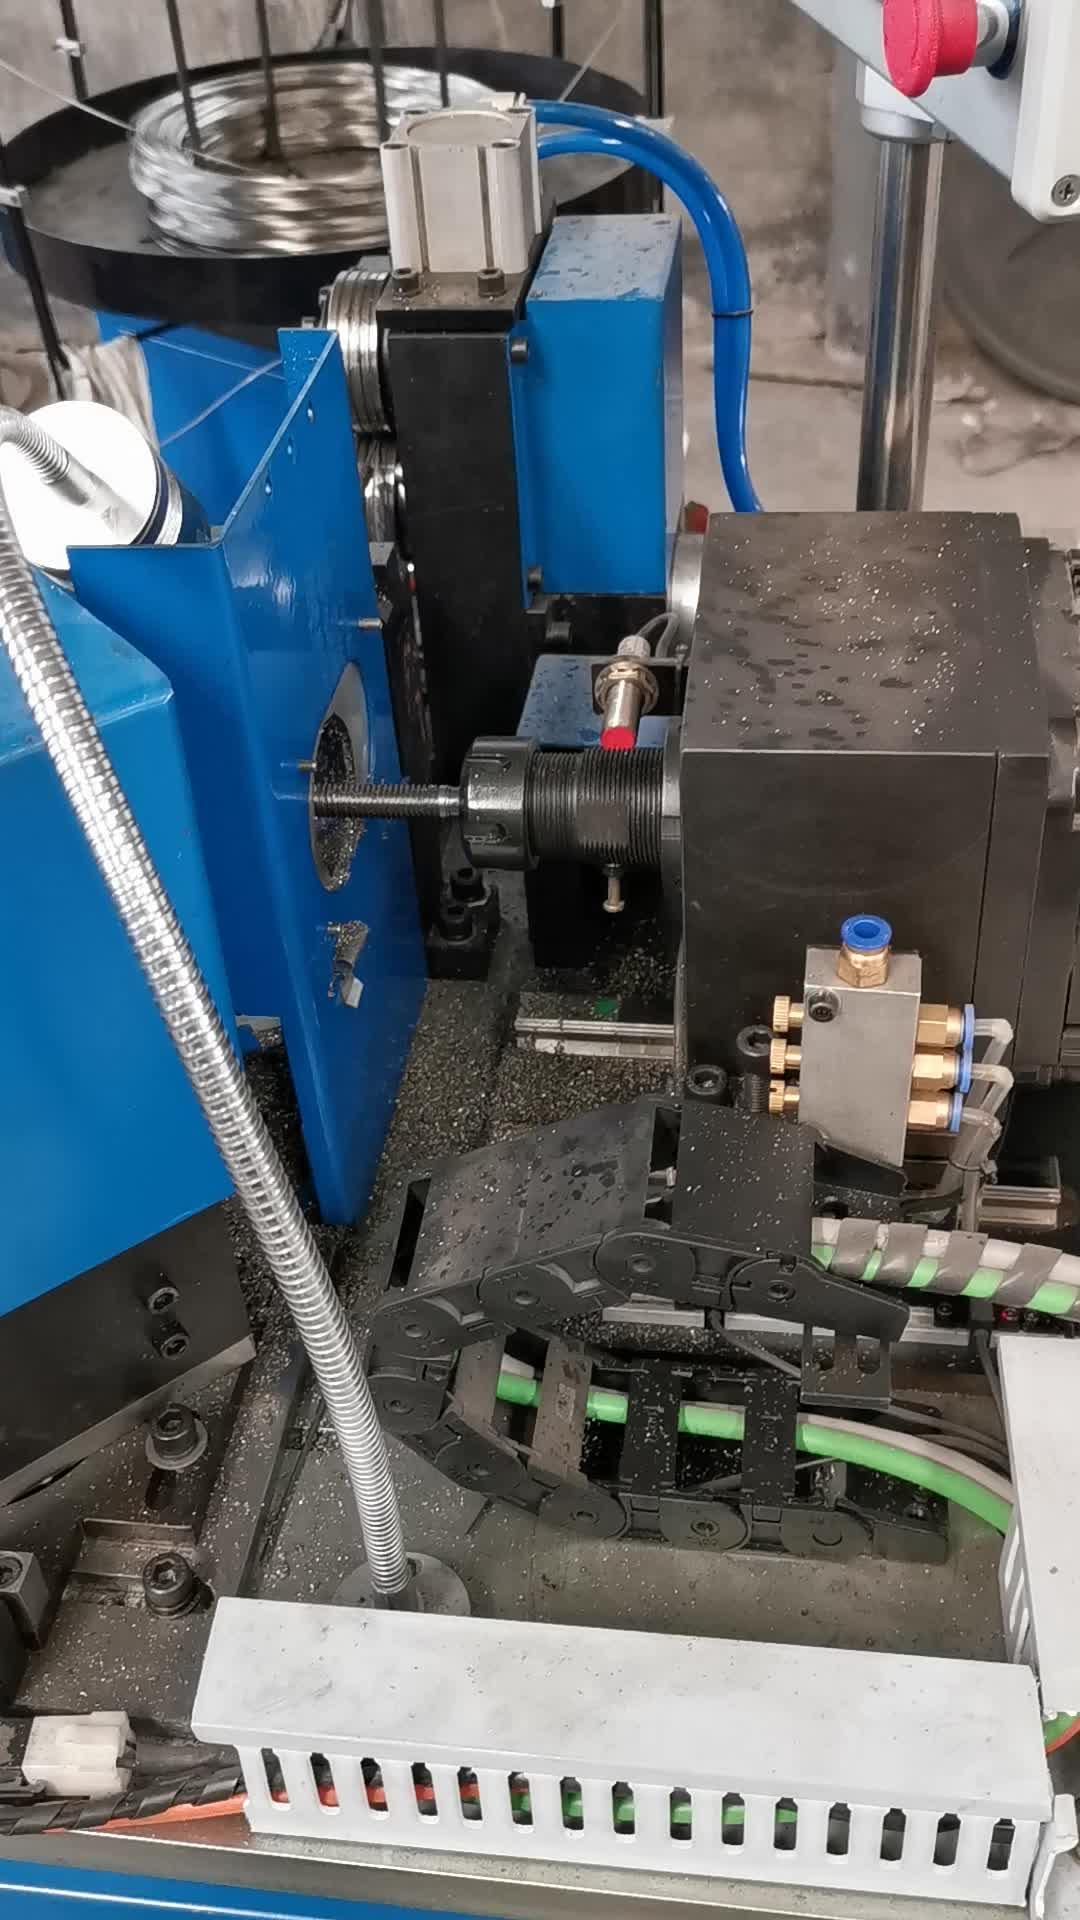 SUS304 Coil Thread repair Insert 1/2''-13 inox threaded inserts for metal